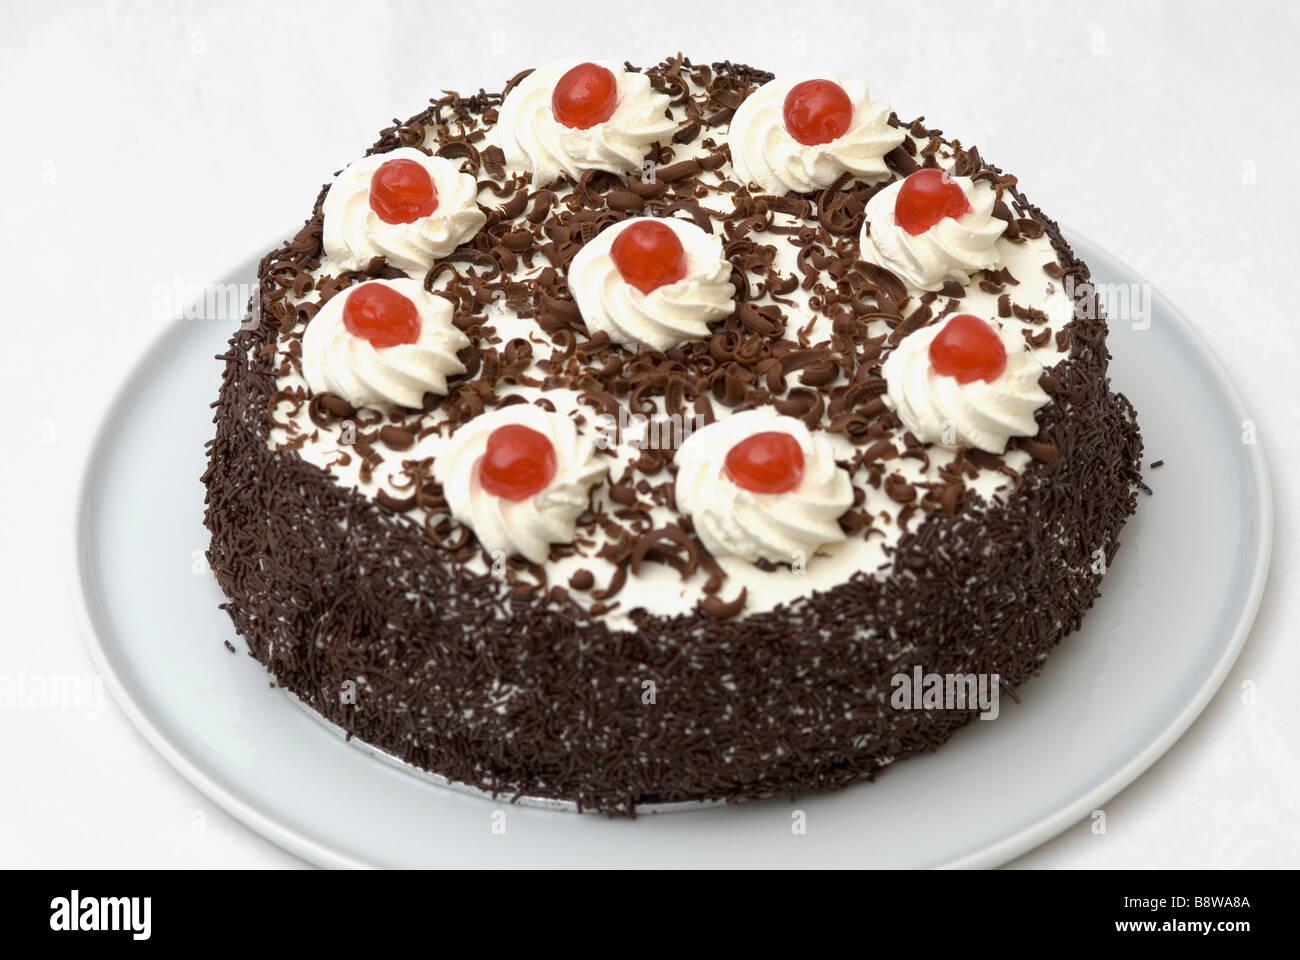 Cherry topped chocolate sponge cake Stock Photo, Royalty Free ...